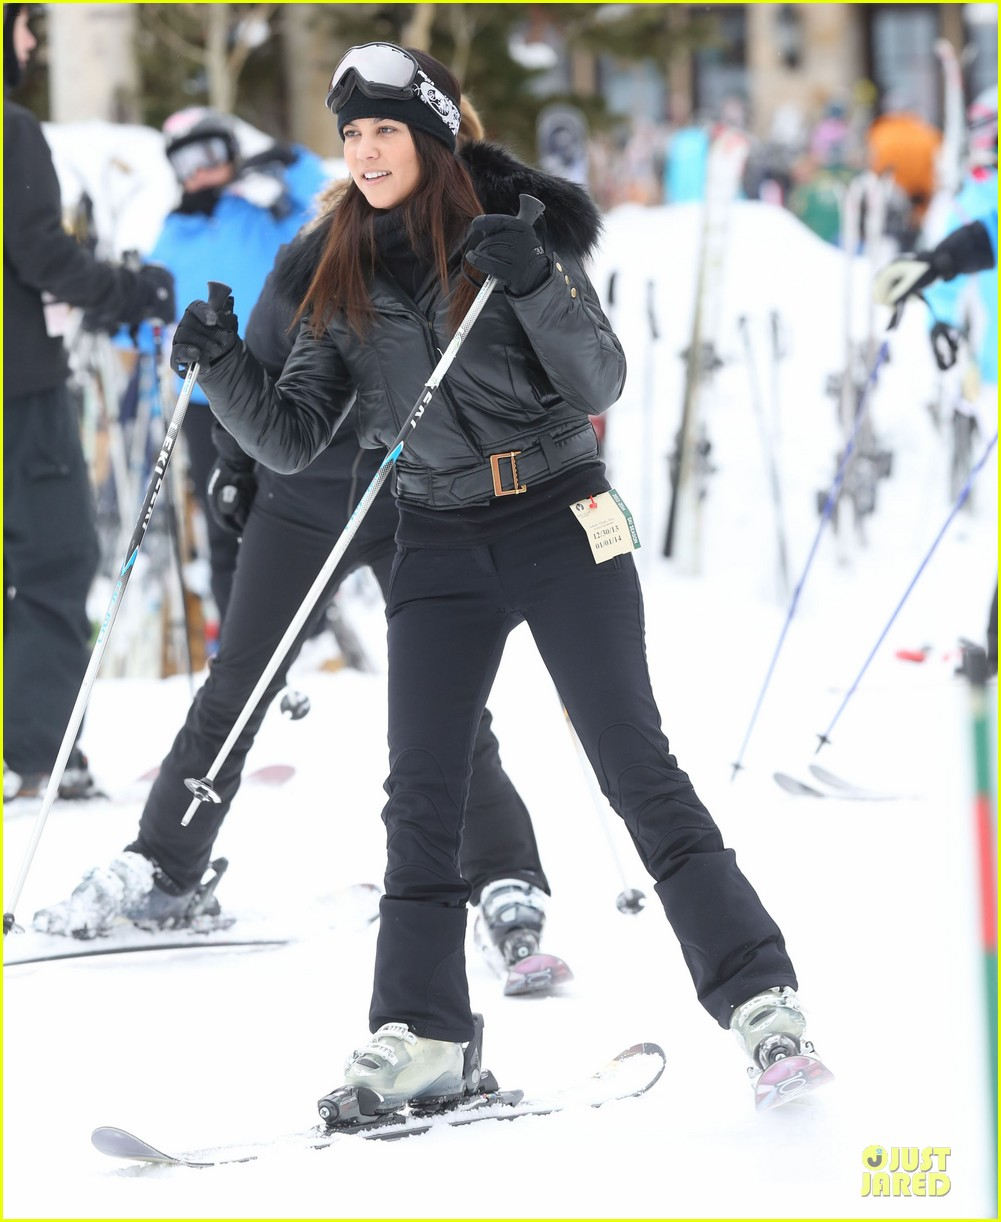 Full Sized Photo of kim kardashian new years eve skiing with kourtney 14 | Photo 3020556 | Just ...